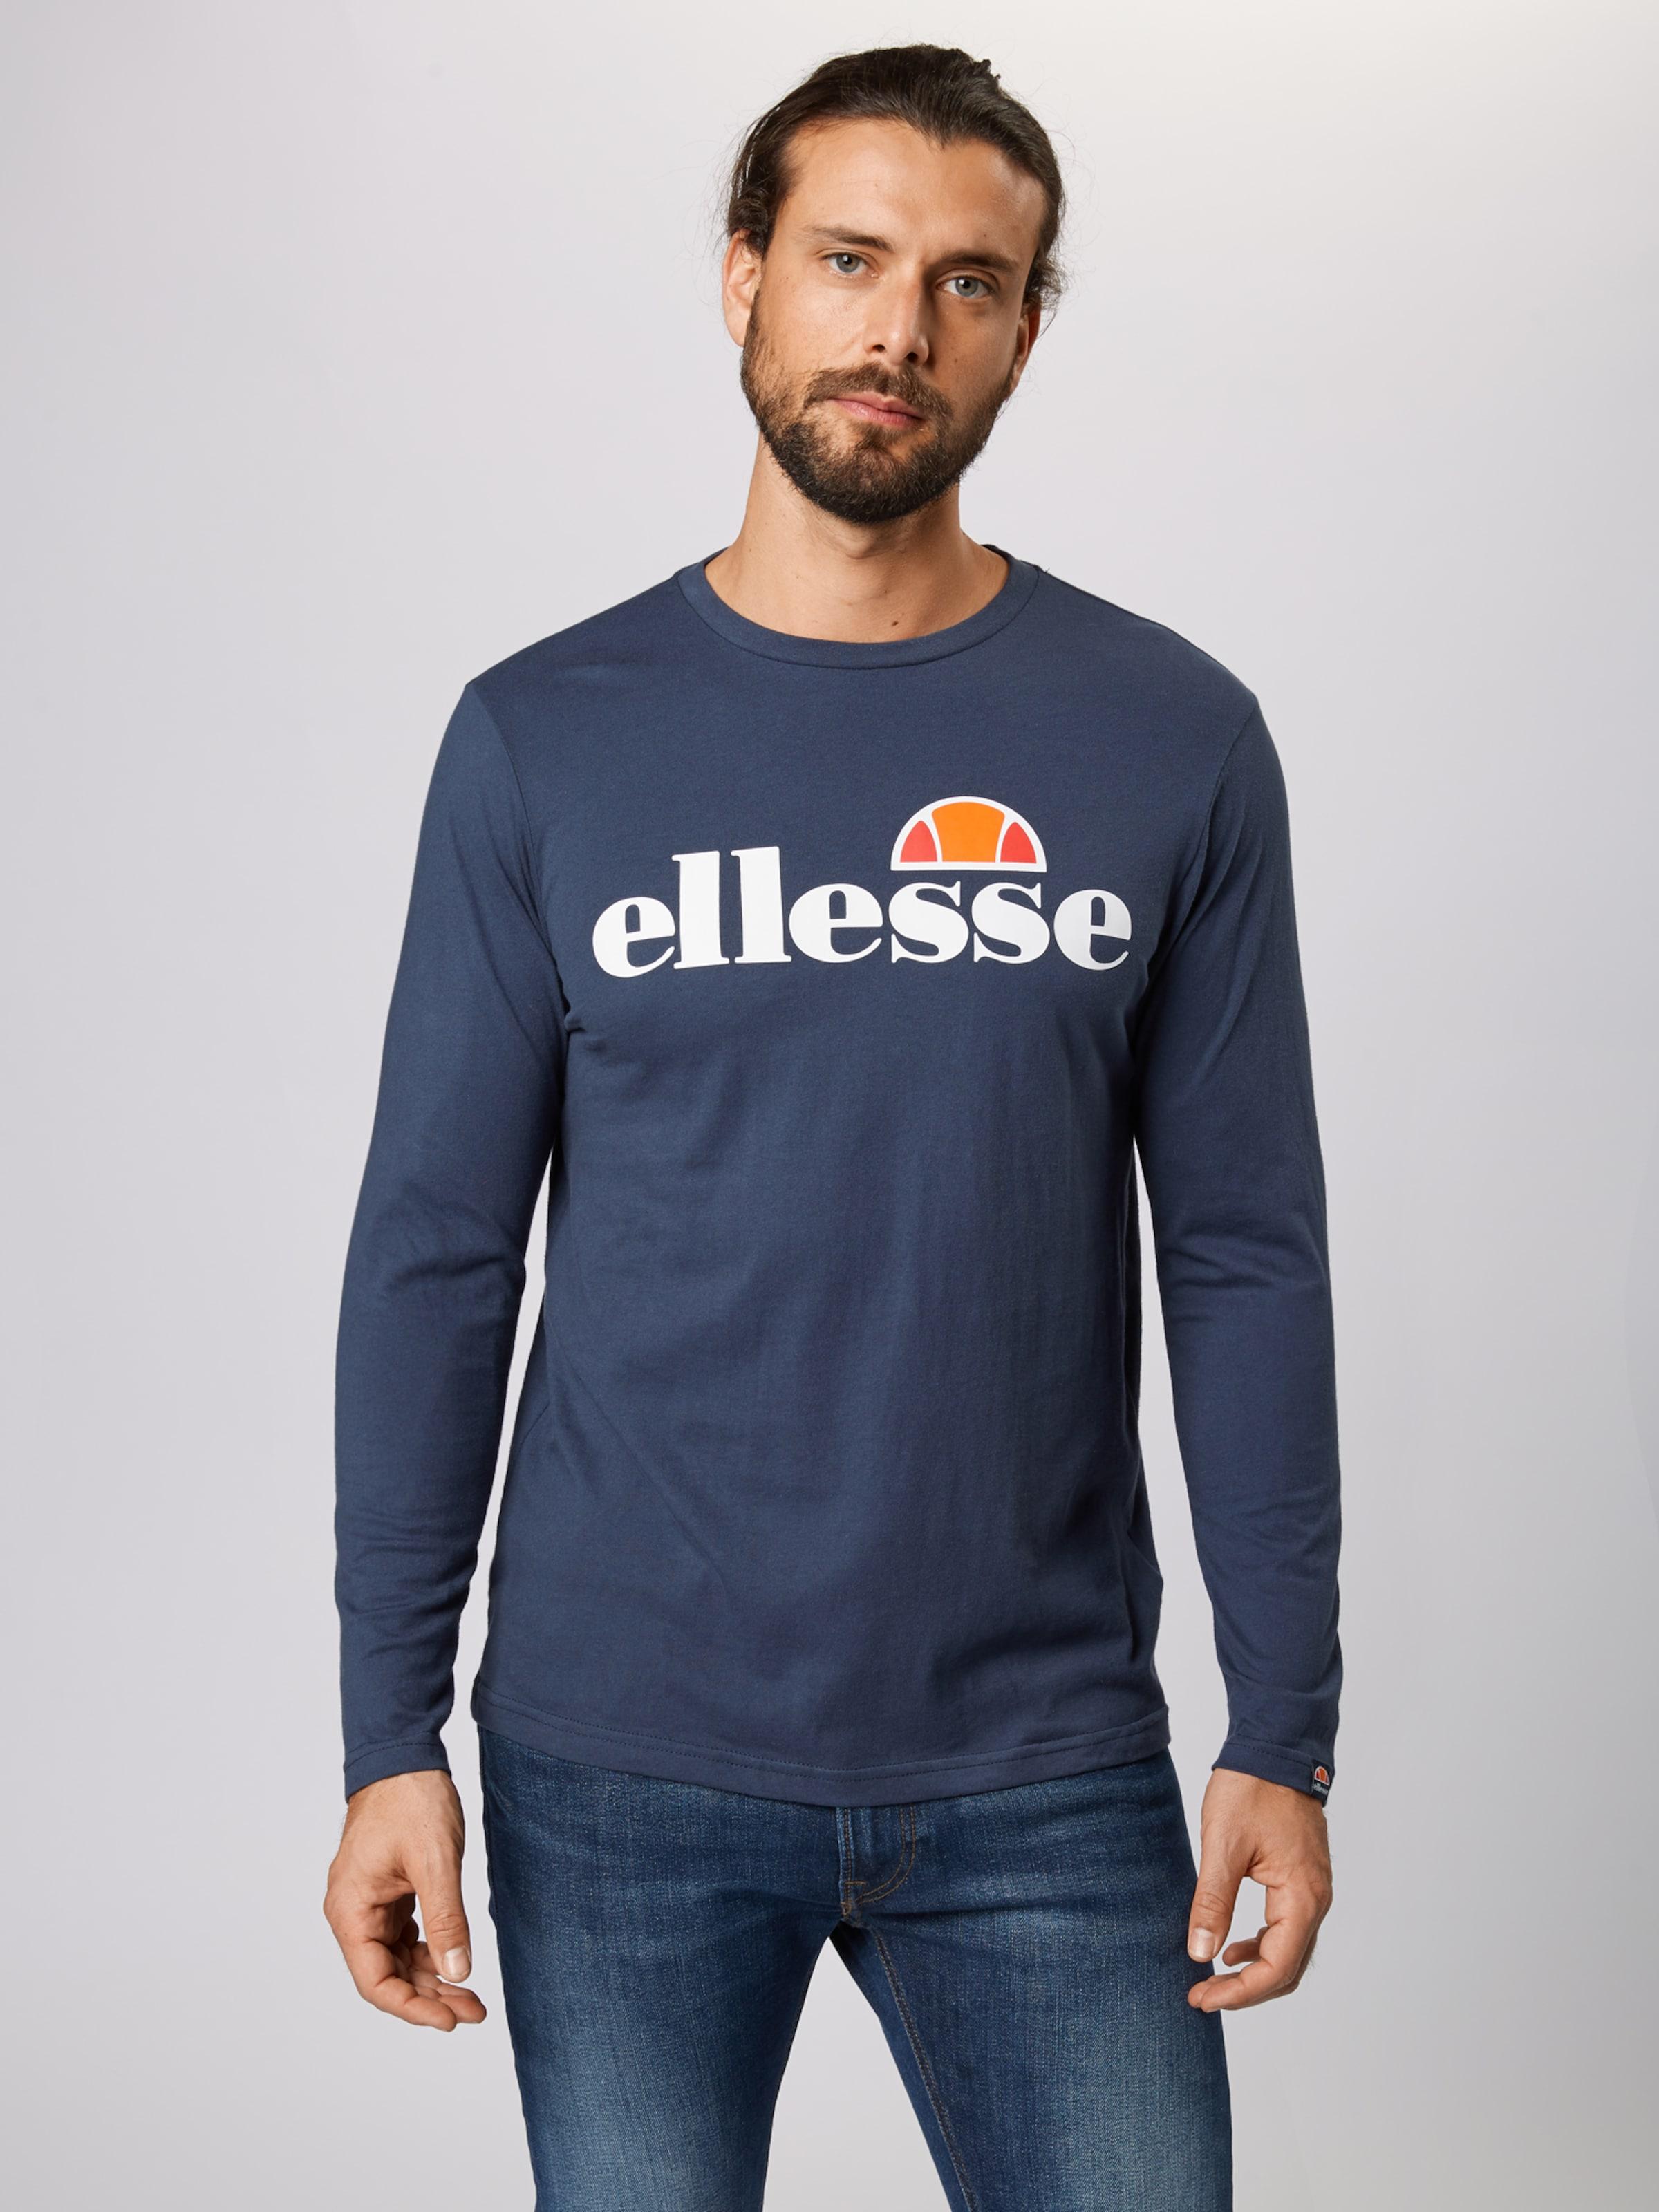 Ellesse 'small Logo Grazie' In Navy Langarmshirt uFKJlT35c1